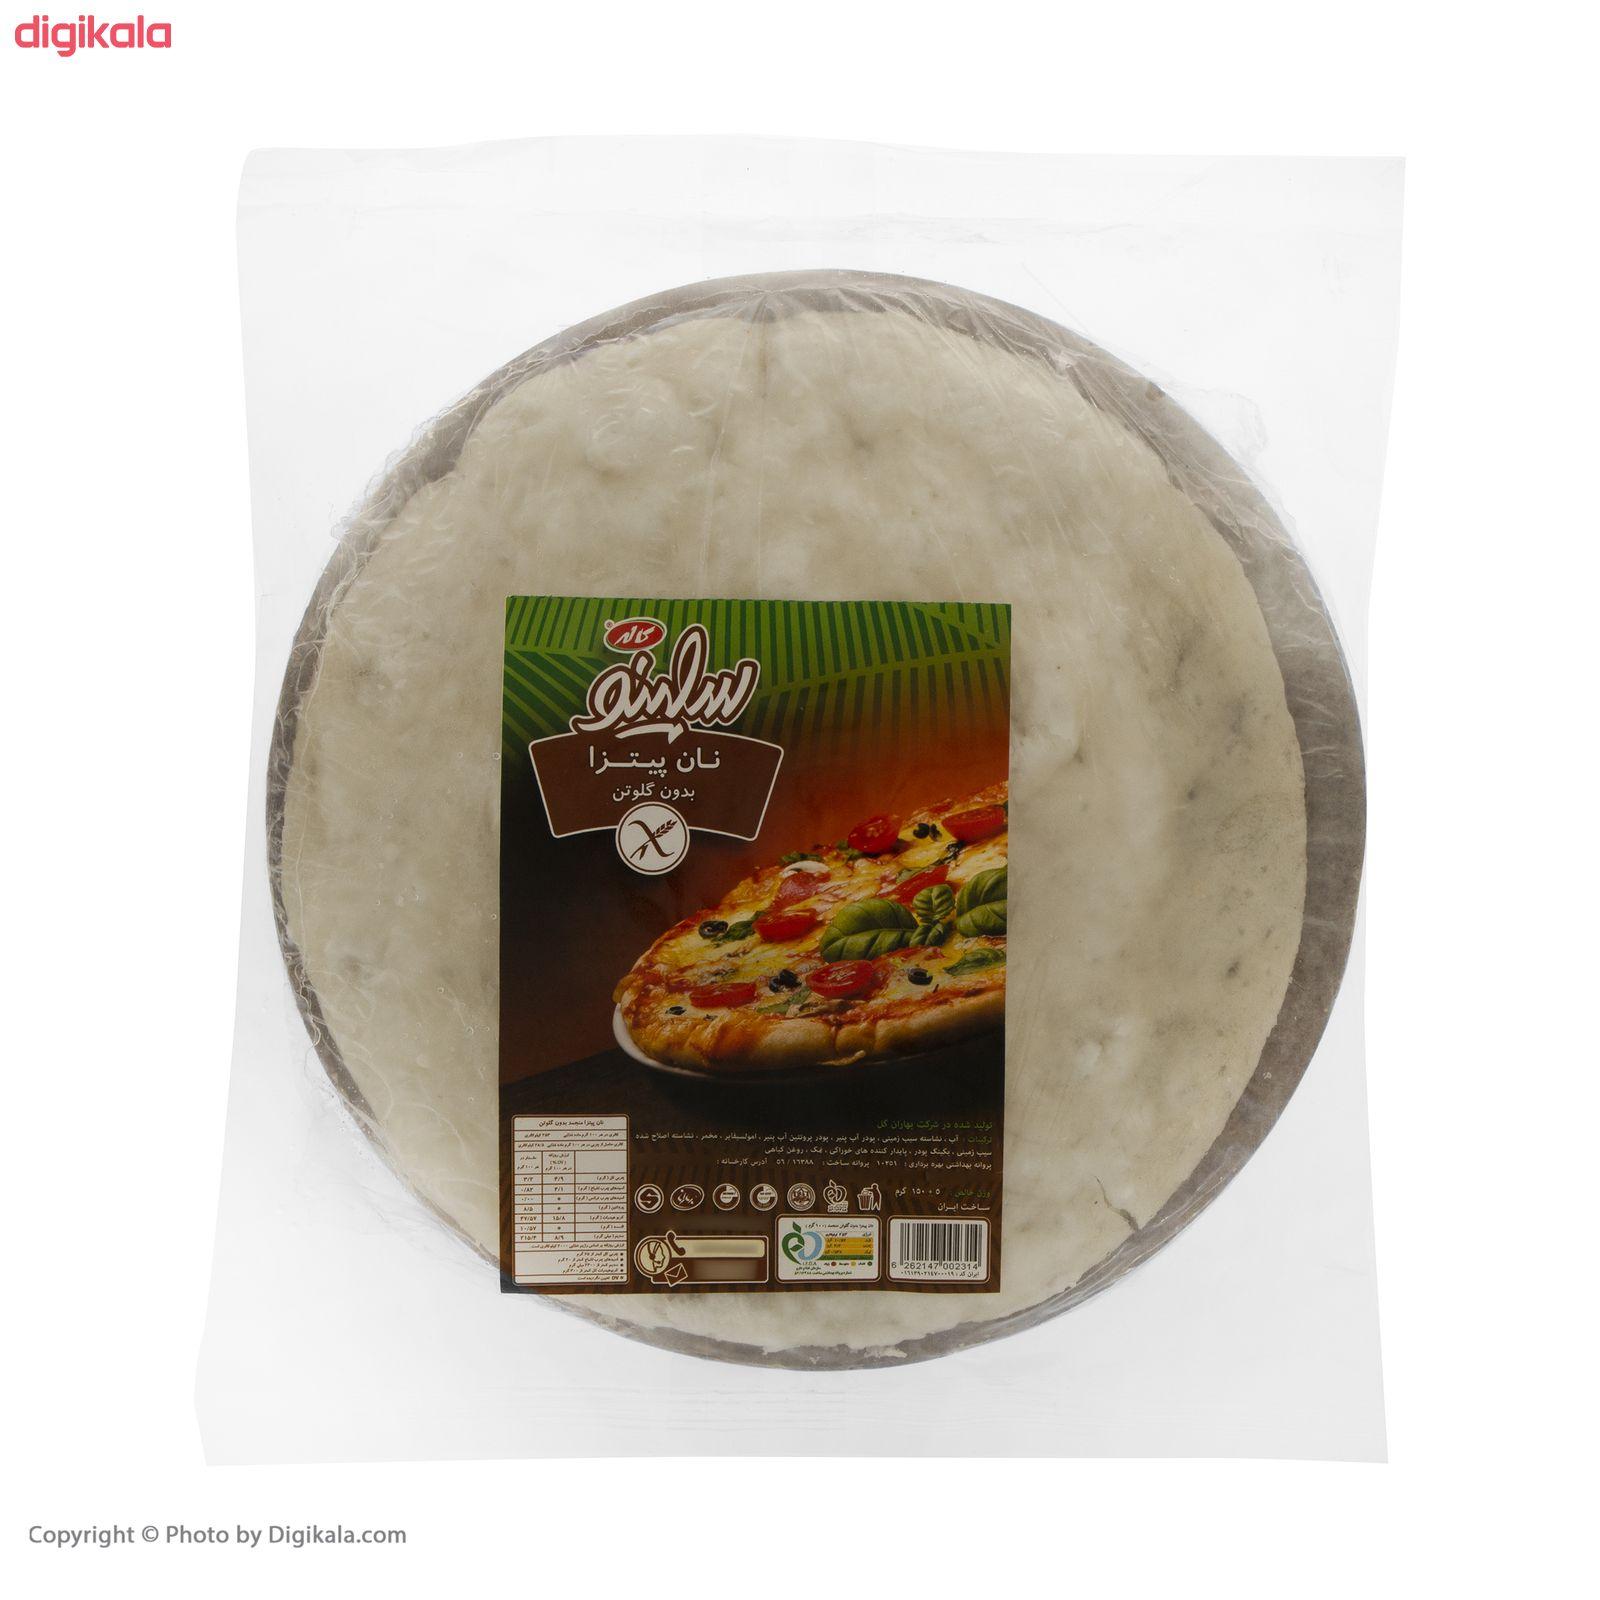 نان پیتزا بدون گلوتن سلینو - 150 گرم  main 1 1